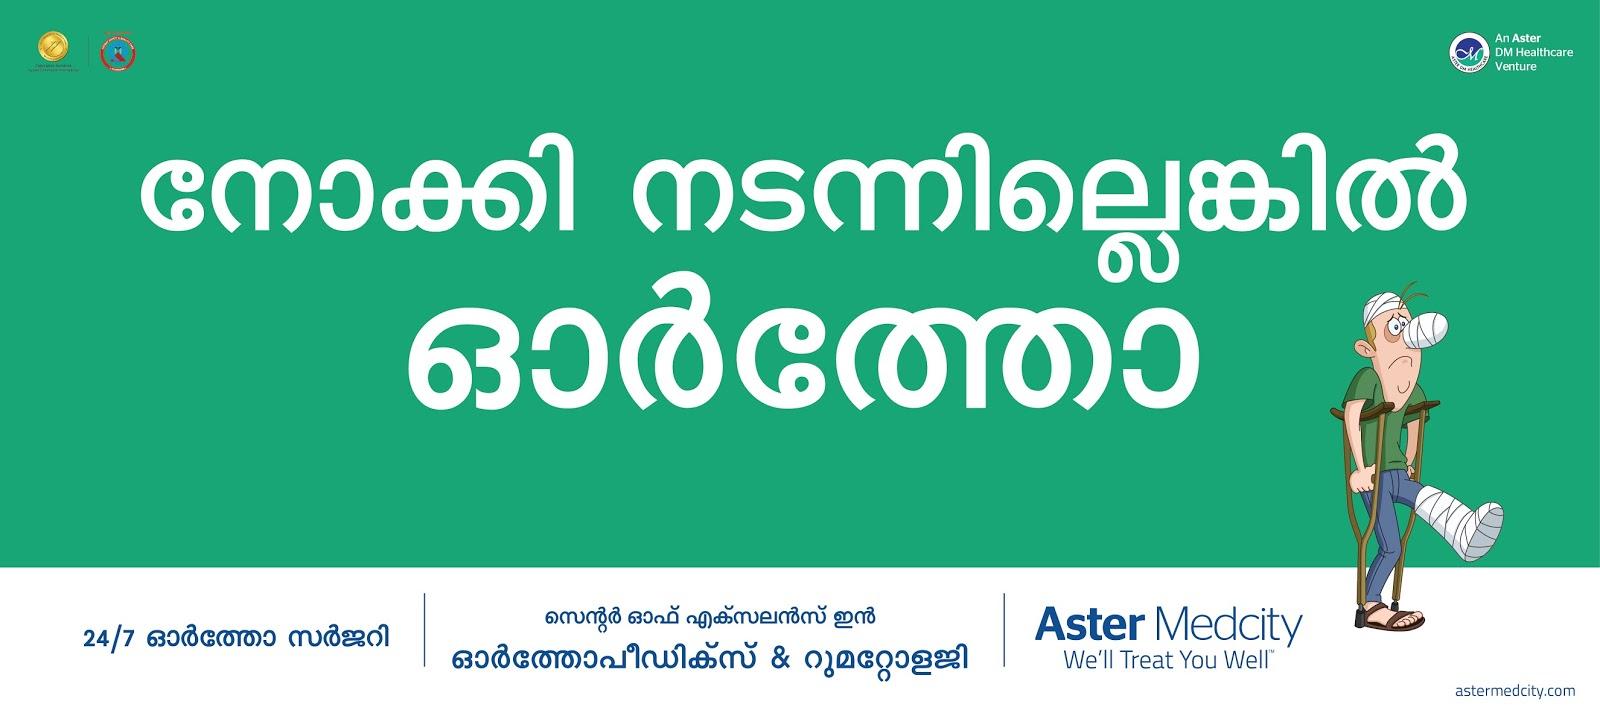 Aster Medcity - 24x7 Ortho Surgery | Print mock-up 1 | Stark Communications Pvt Ltd